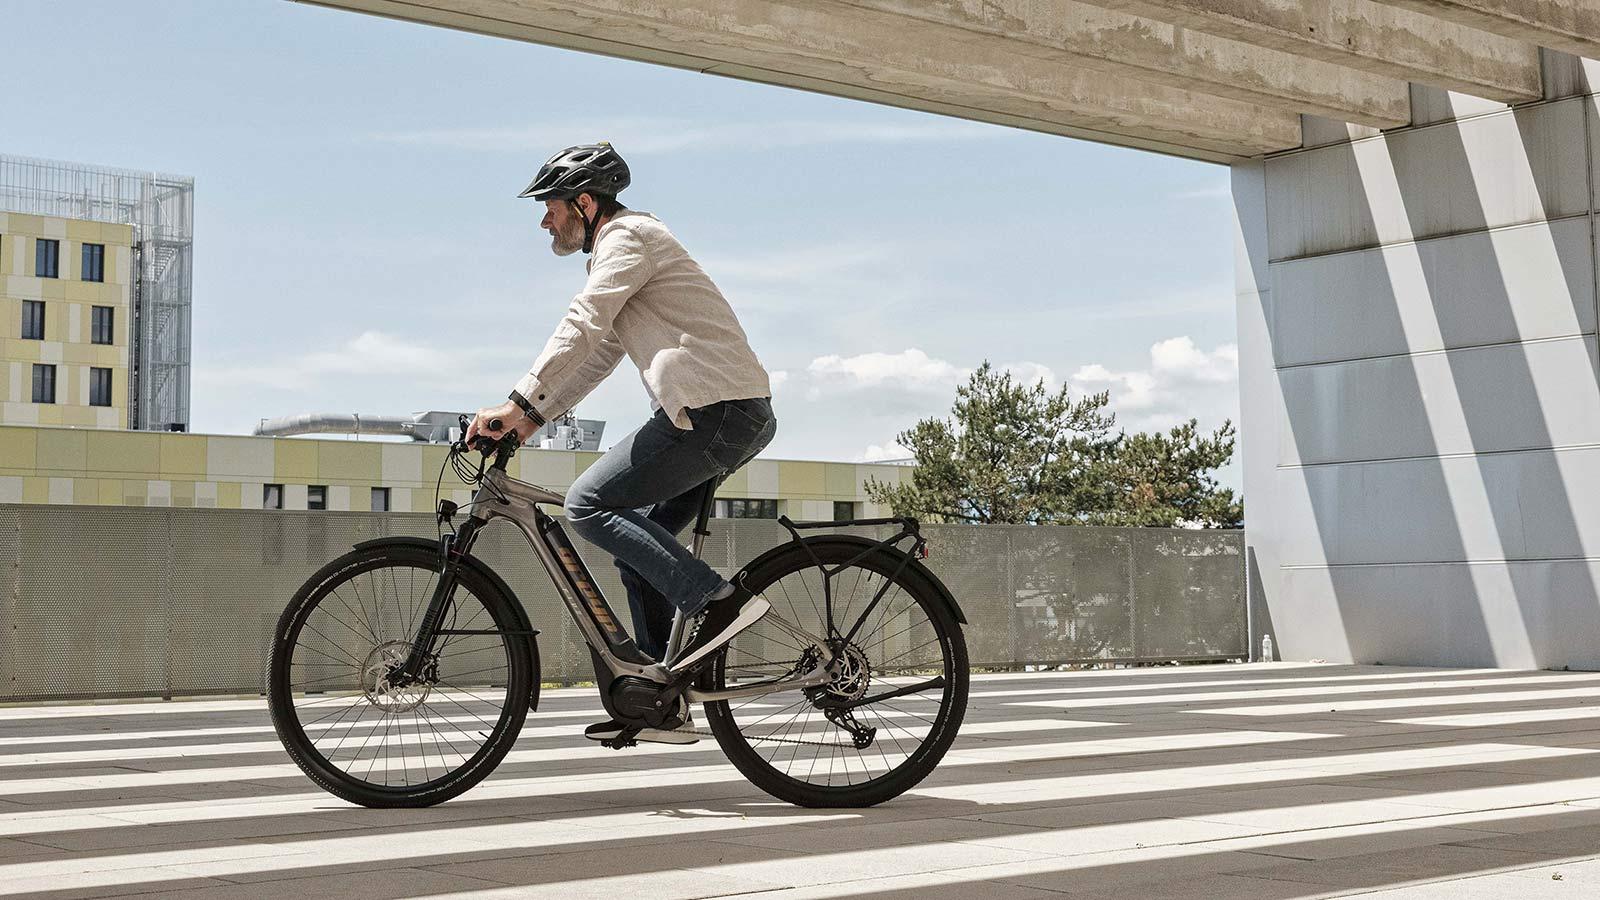 Greyp T5 alloy trekking e-bike hardtail eSUV city commuter